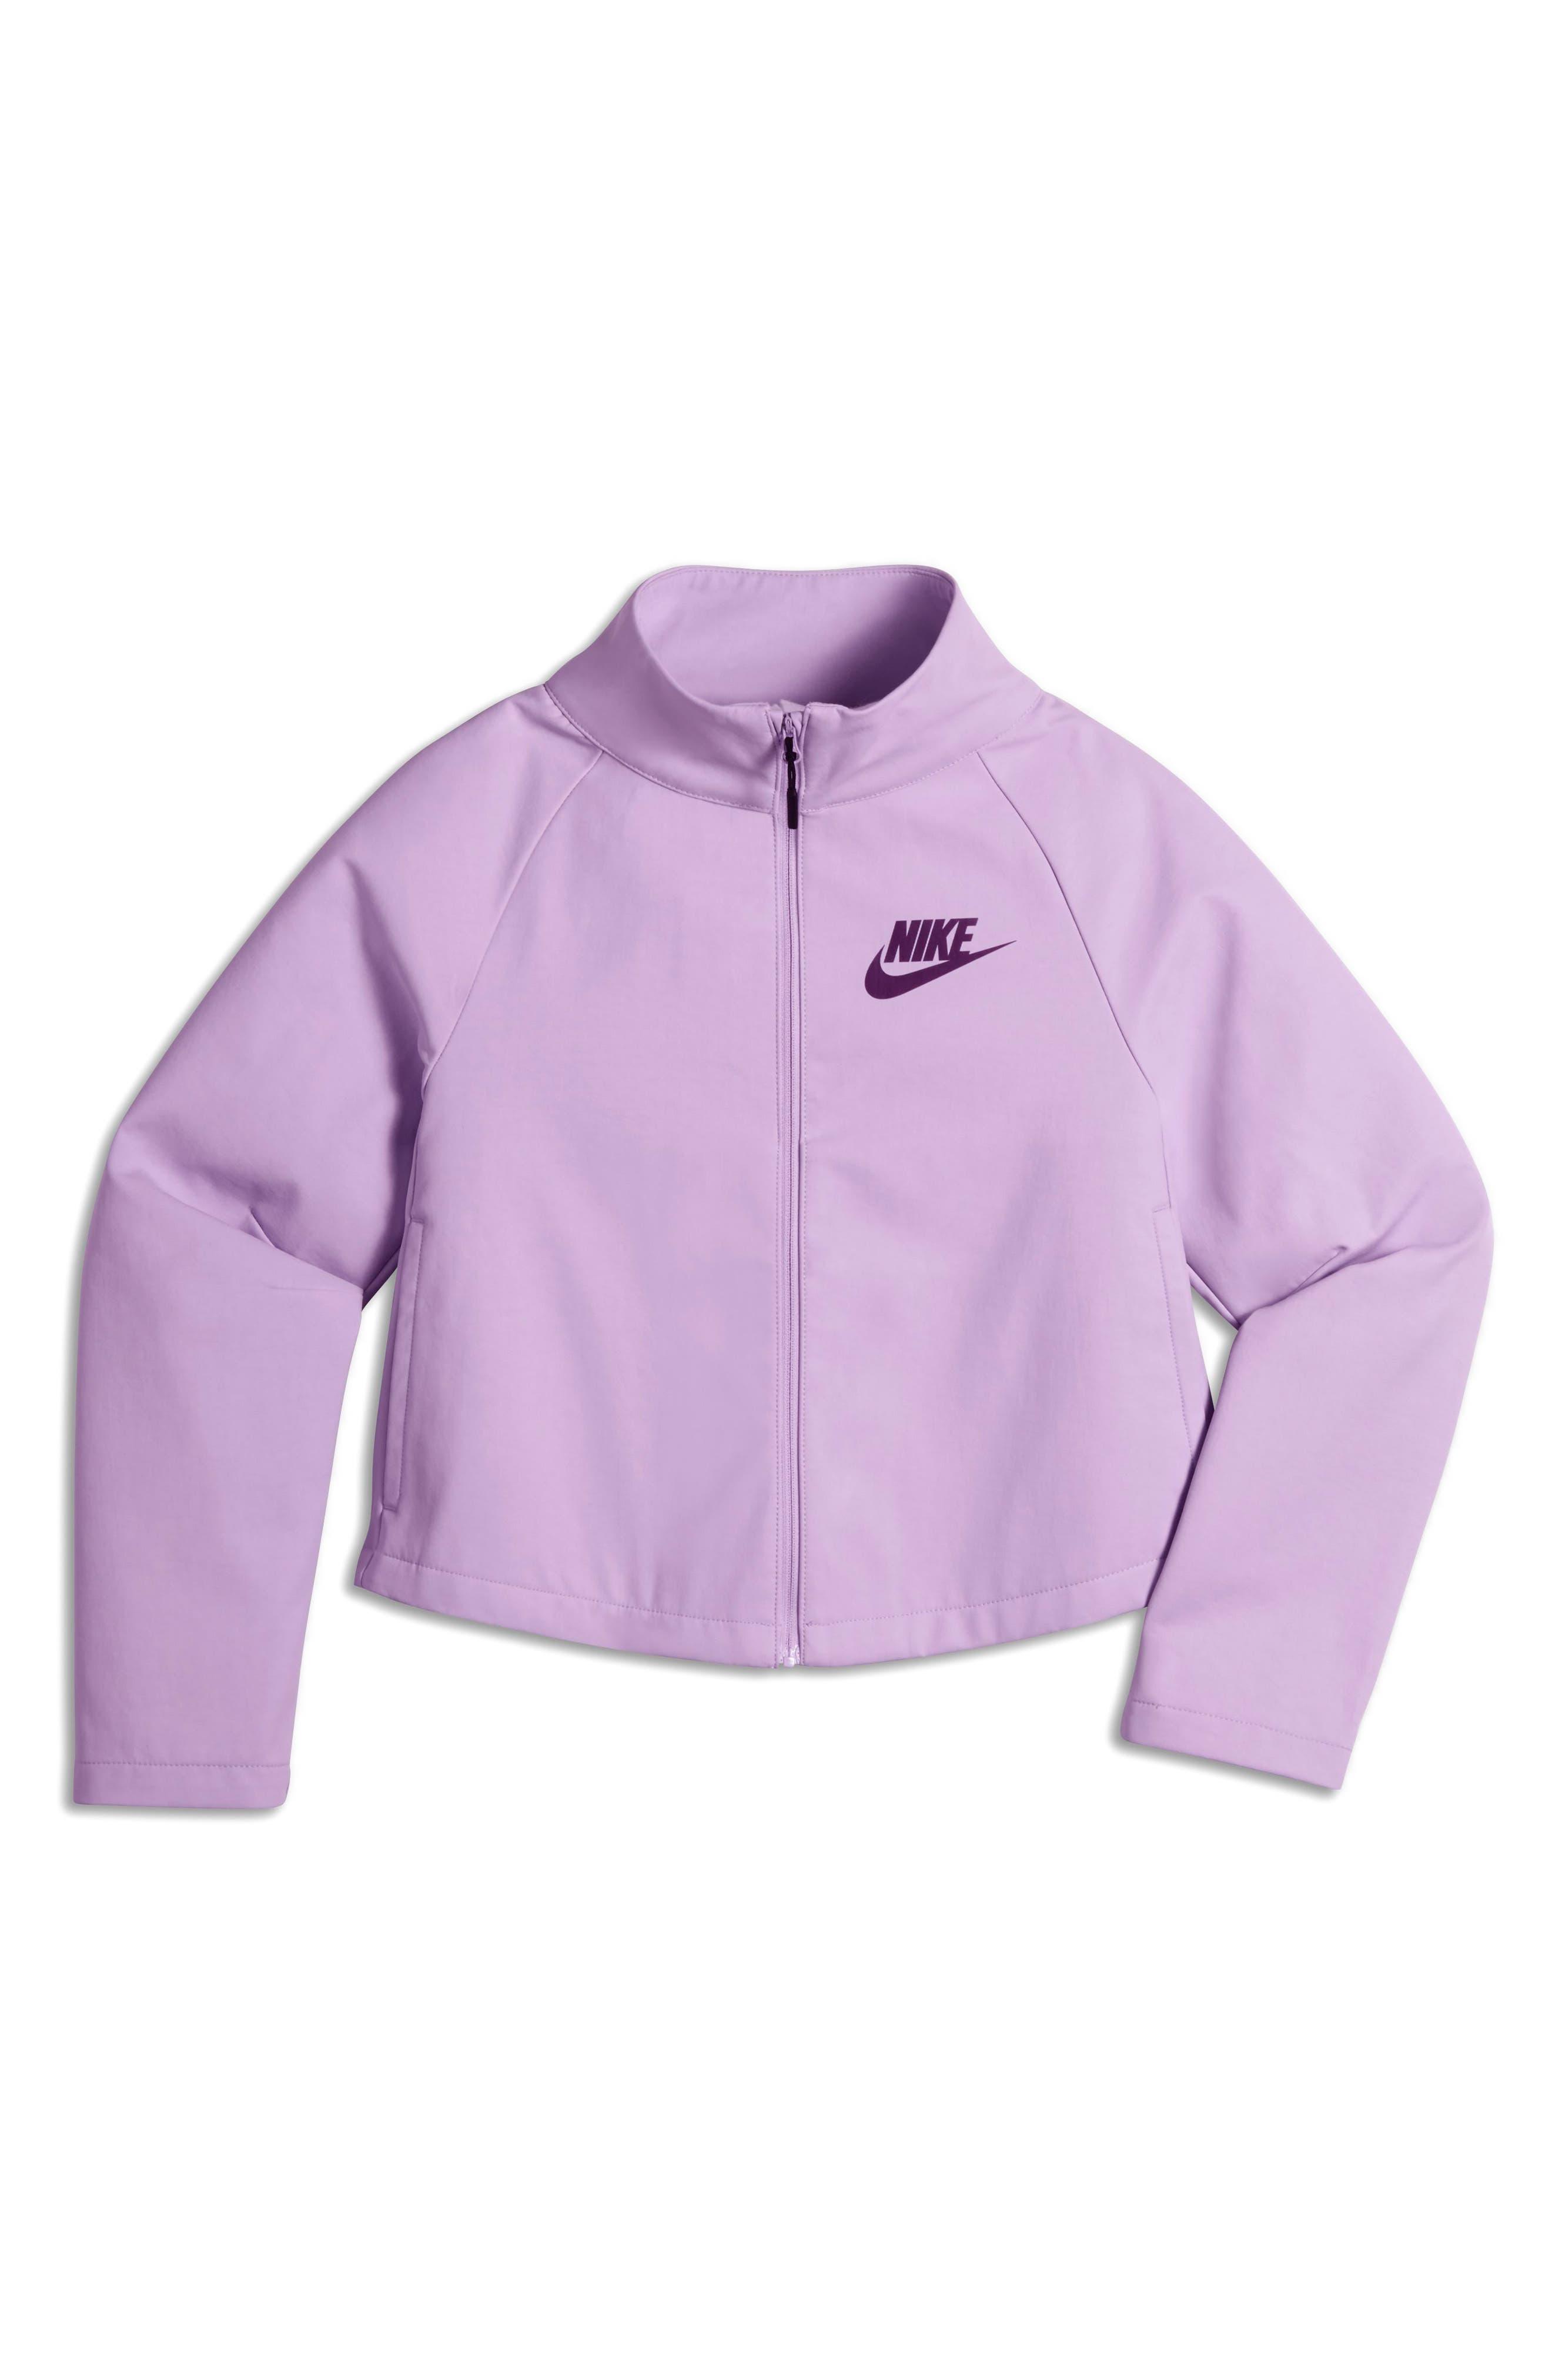 Tech Water Repellent Jacket,                         Main,                         color, Violet Mist/ Night Purple